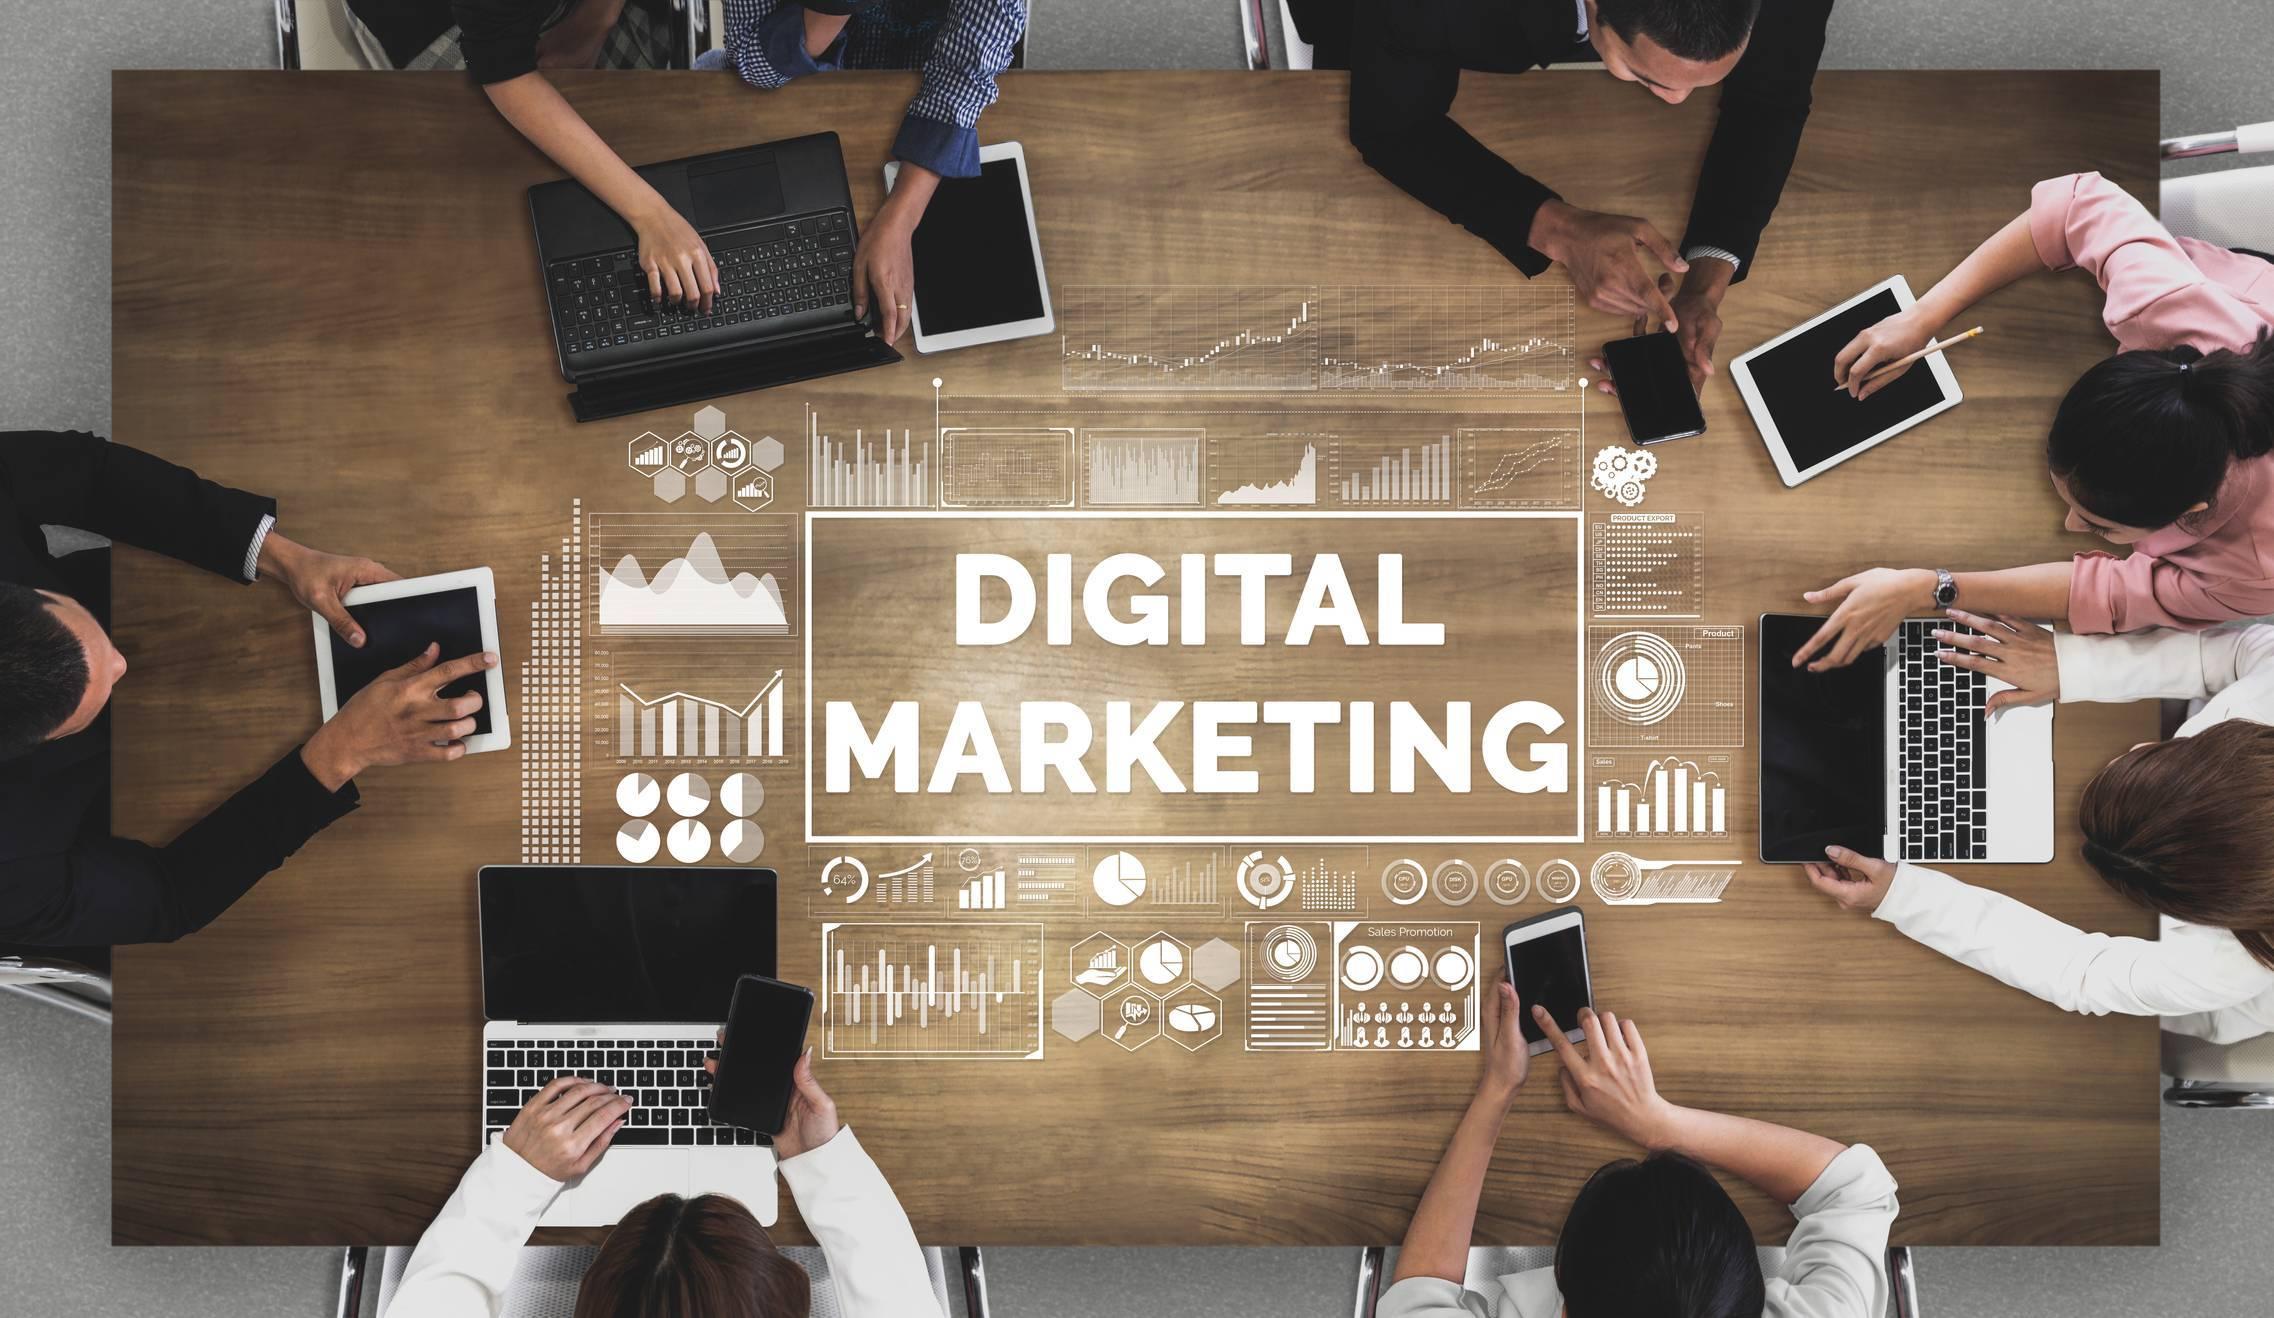 Les enjeux du marketing digital